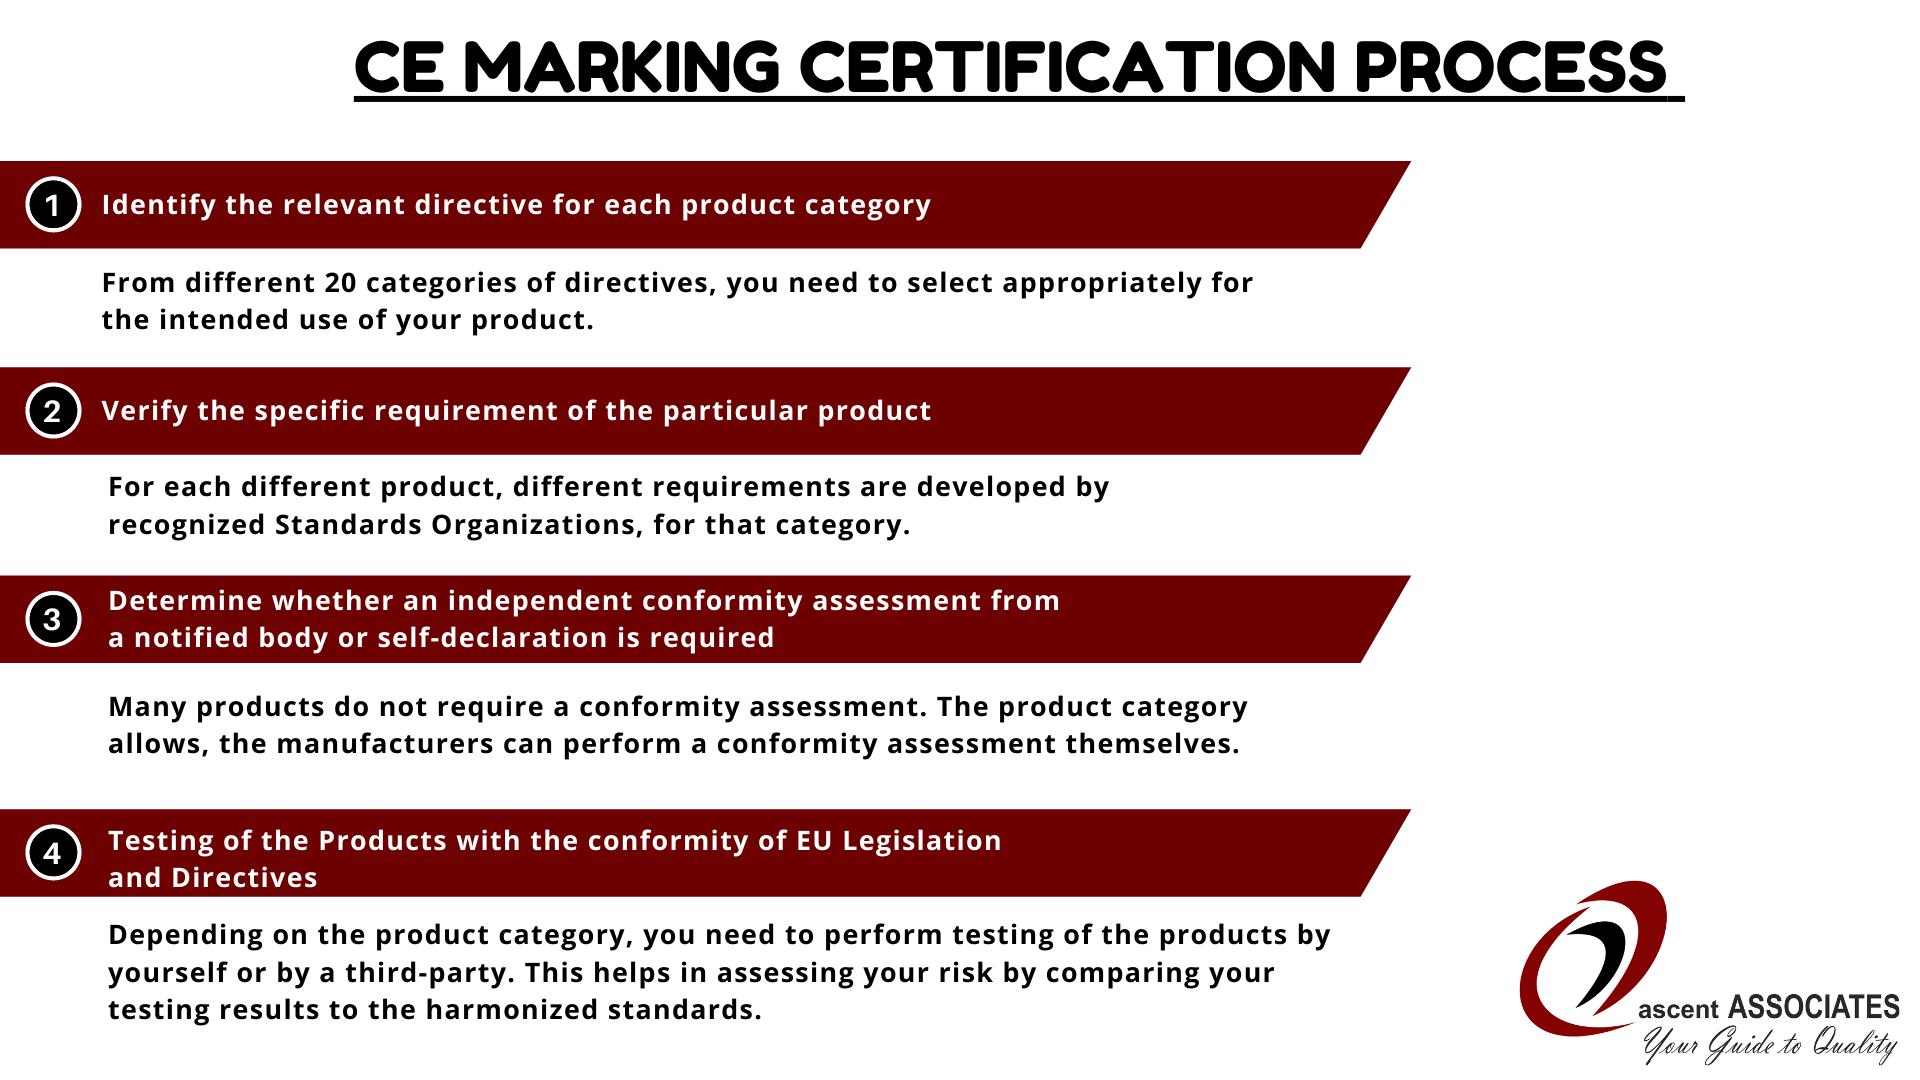 CE Marking Certification Process